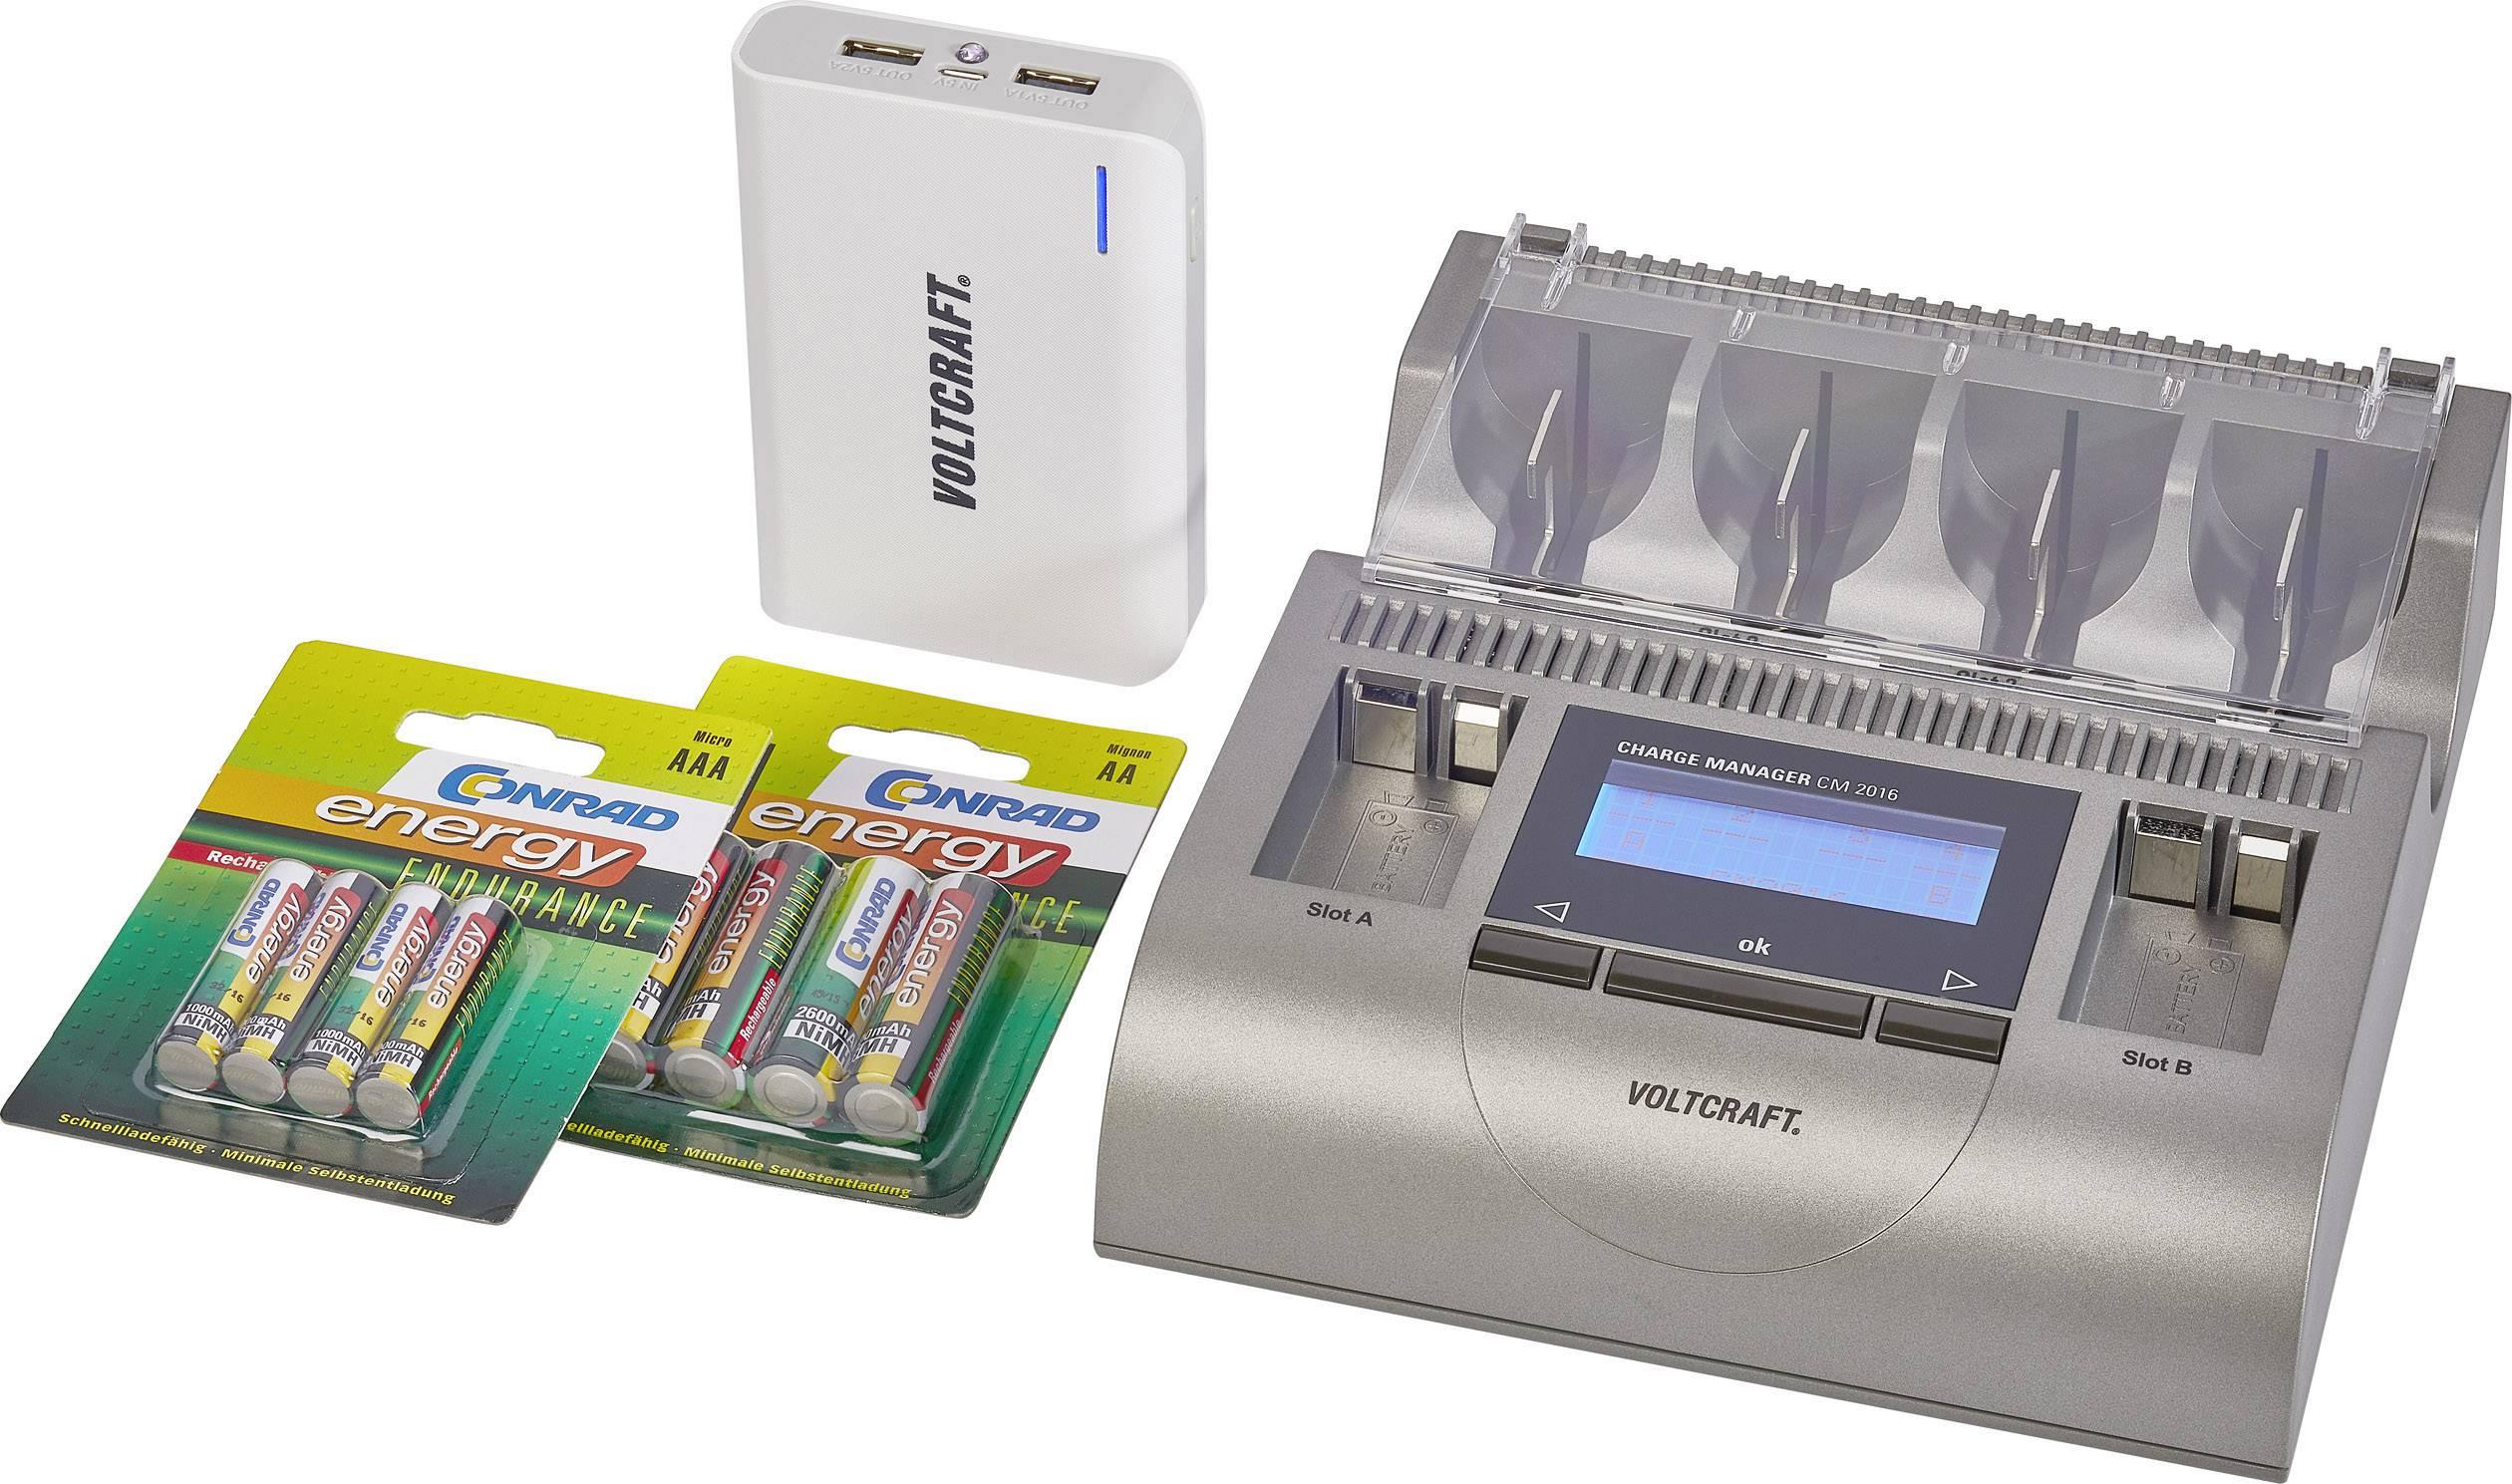 Nabíjačka na okrúhle akumulátory VOLTCRAFT Charge Manager CM2016 + Endurance + PB17, micro (AAA), mignon (AA), baby (C), mono (D), 9 V blok